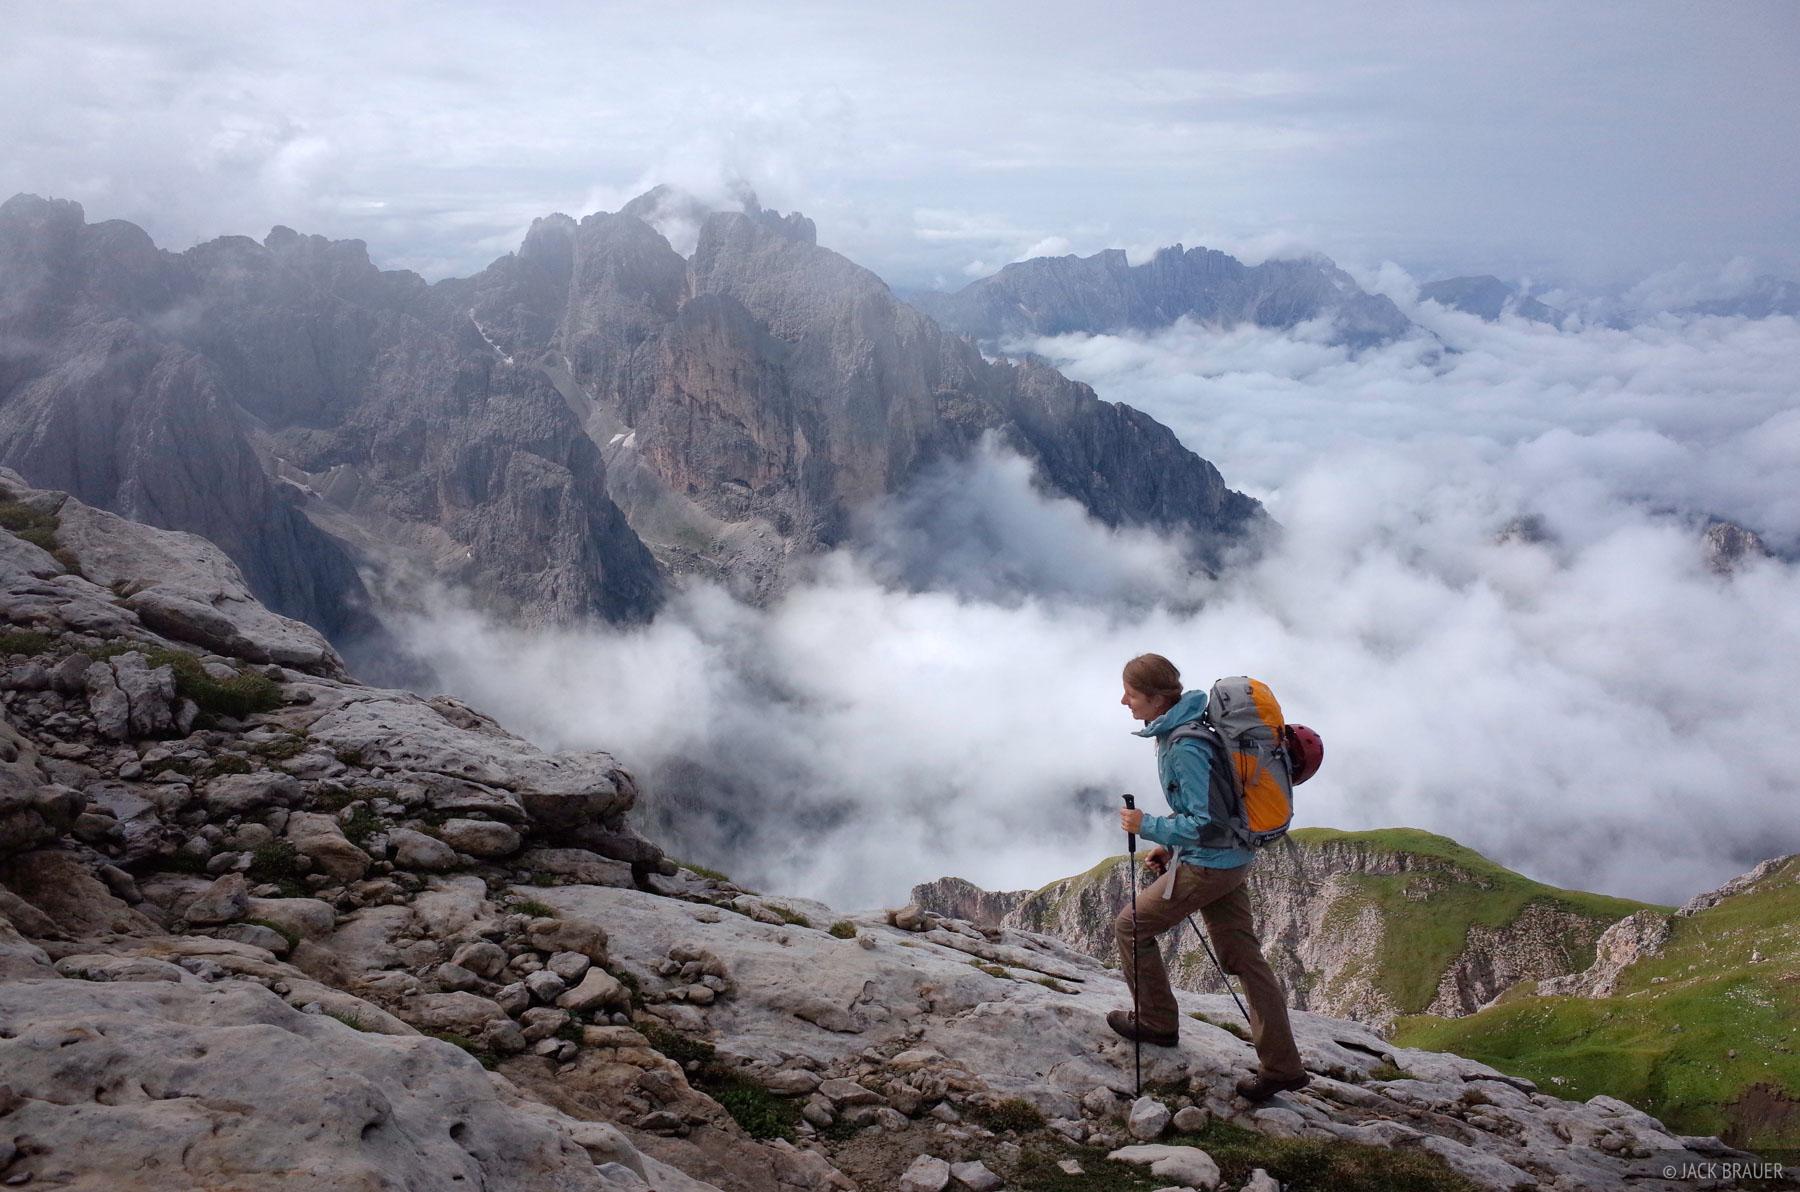 Dolomites, Italy, Rosengarten, Maximilian, Cima di Terrarosa, hiking, photo